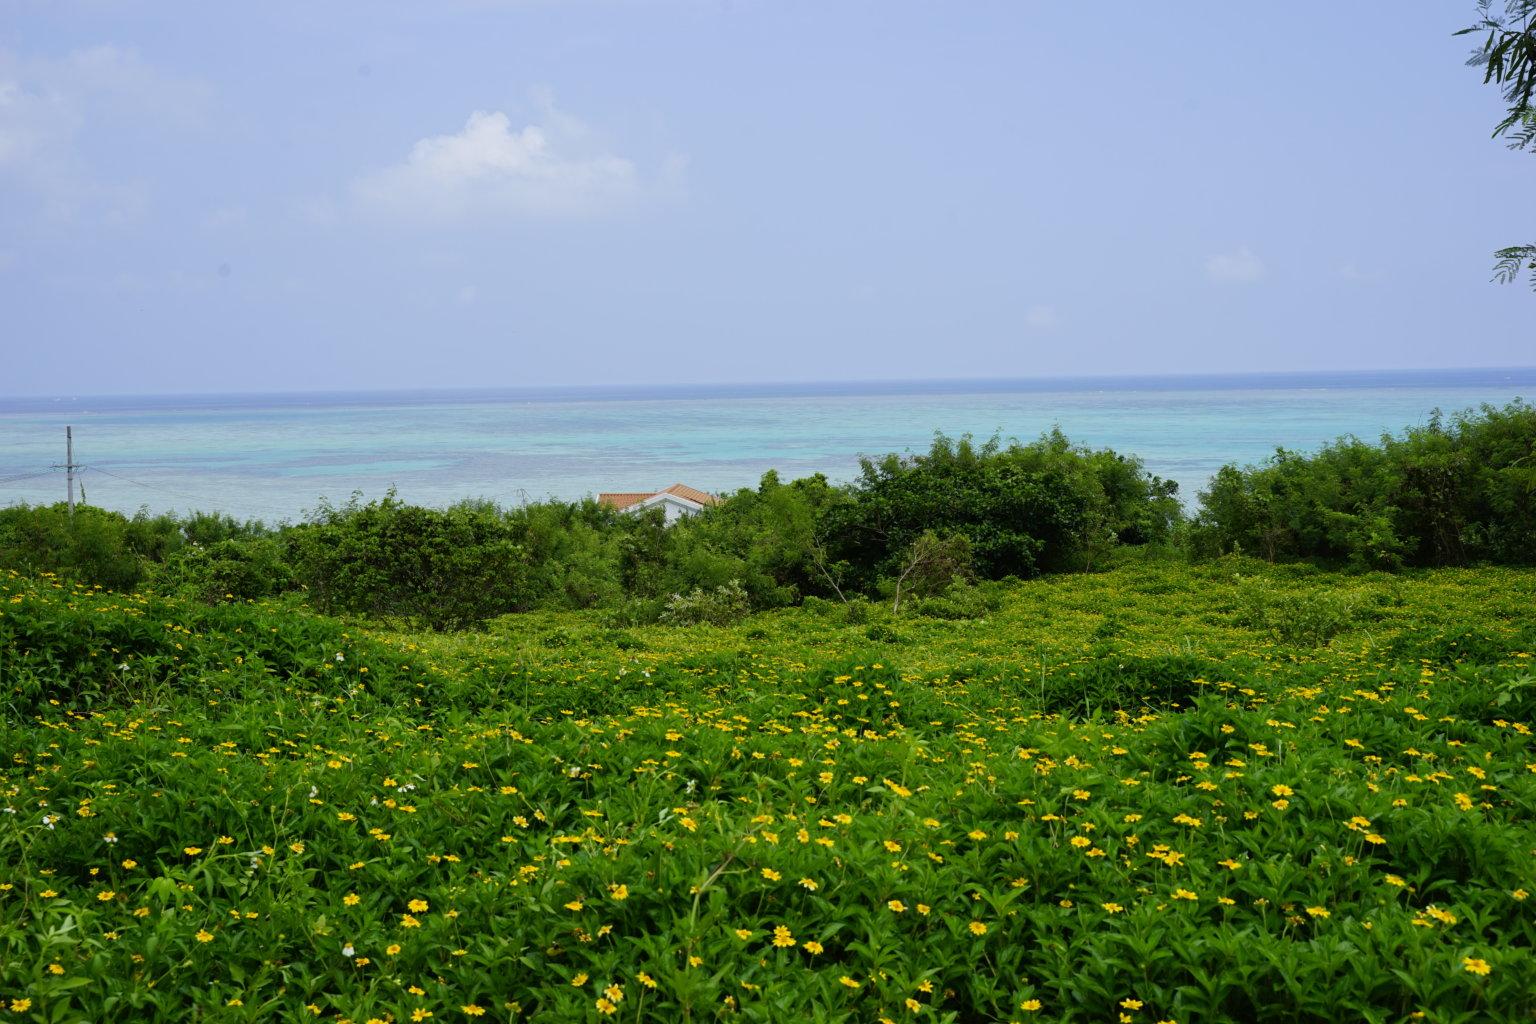 DSC8848 1536x1024 - 【沖縄 小浜島】石垣島から日帰りも!リゾートアイランドをサイクリングしよう!